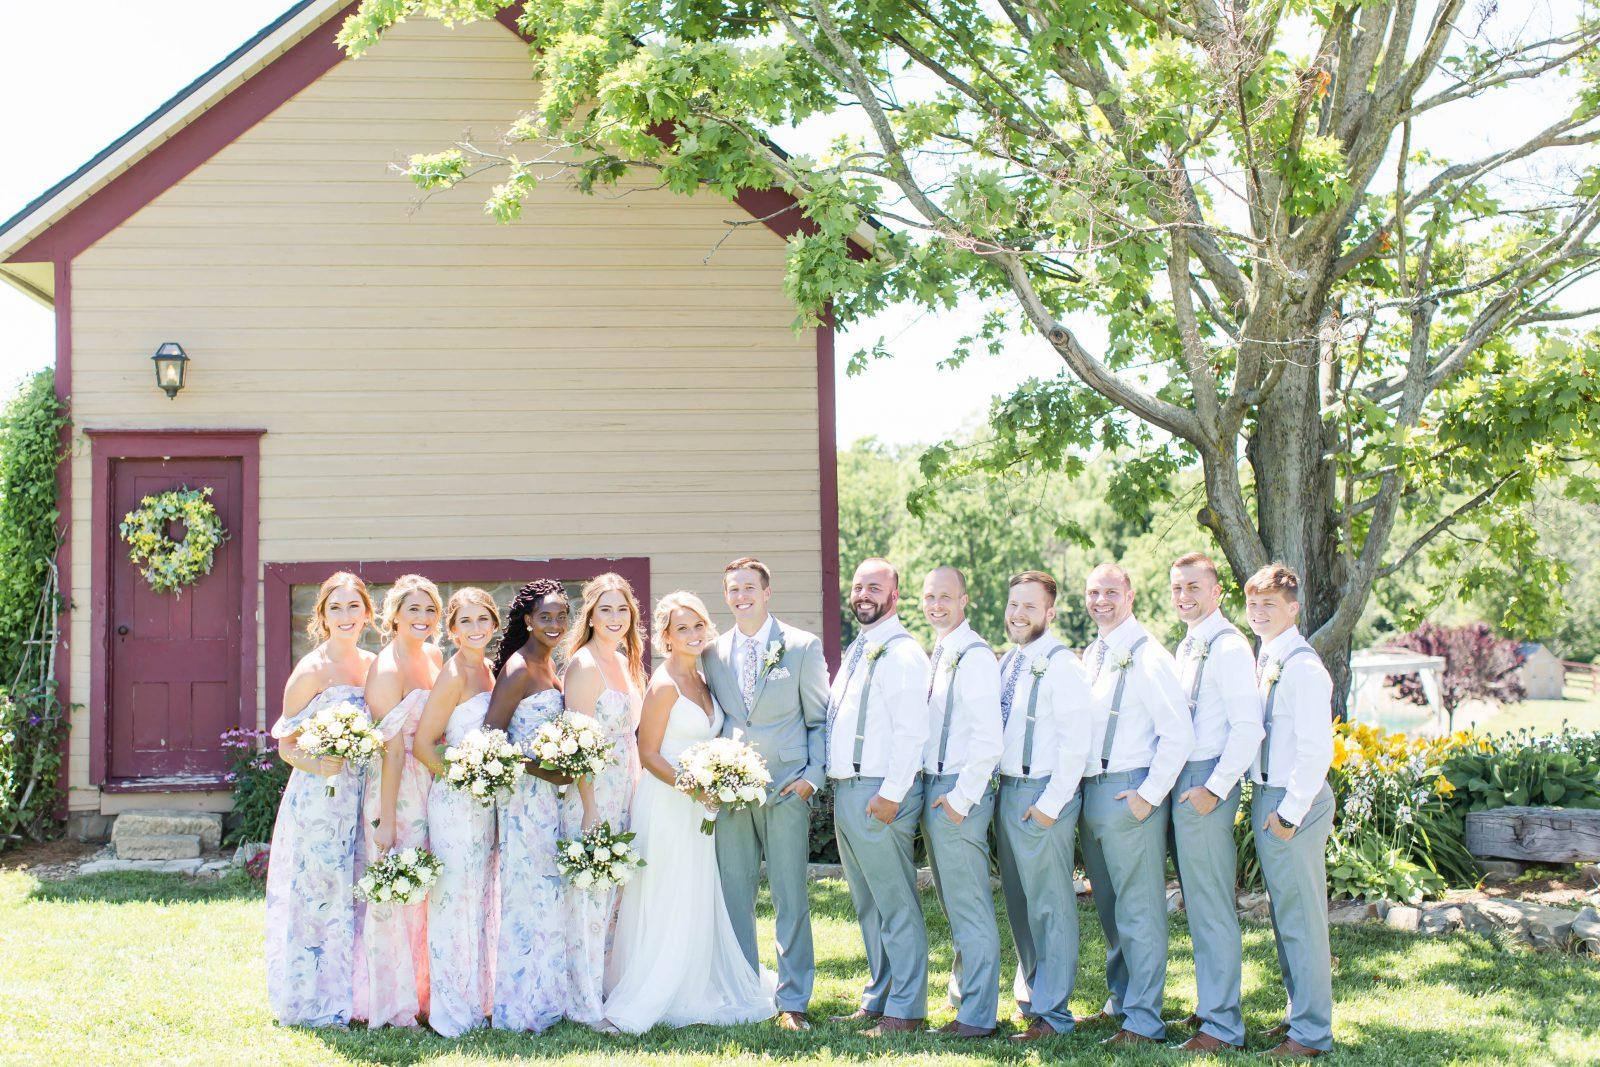 peacock-ridge-summer-wedding-photographer-akron-ohio-loren-jackson-photography-55